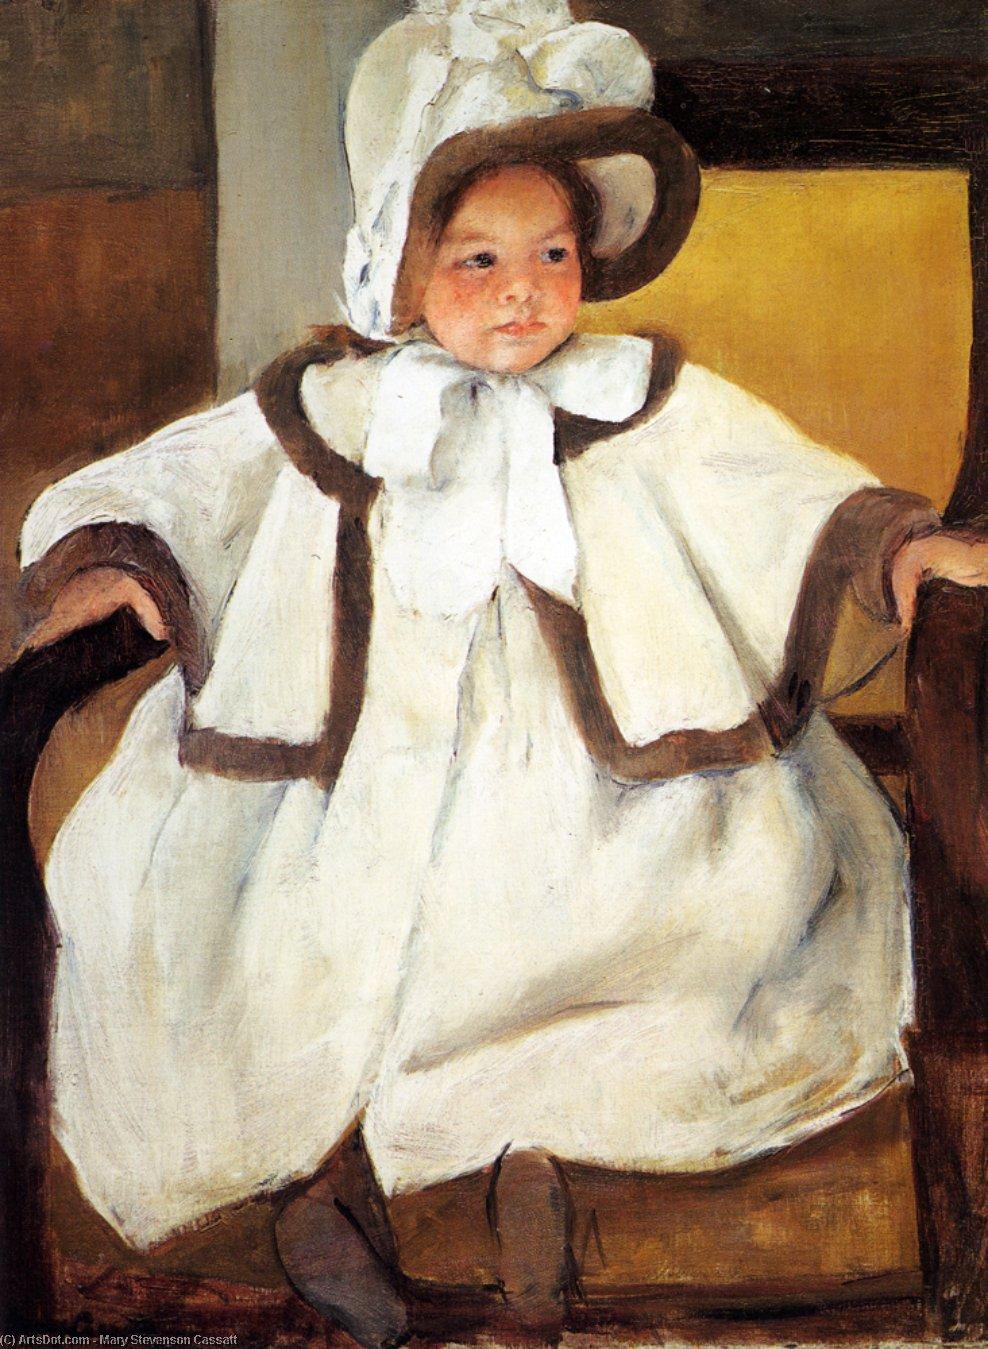 Wikioo.org - The Encyclopedia of Fine Arts - Painting, Artwork by Mary Stevenson Cassatt - Ellen Mary Cassatt in a White Coat